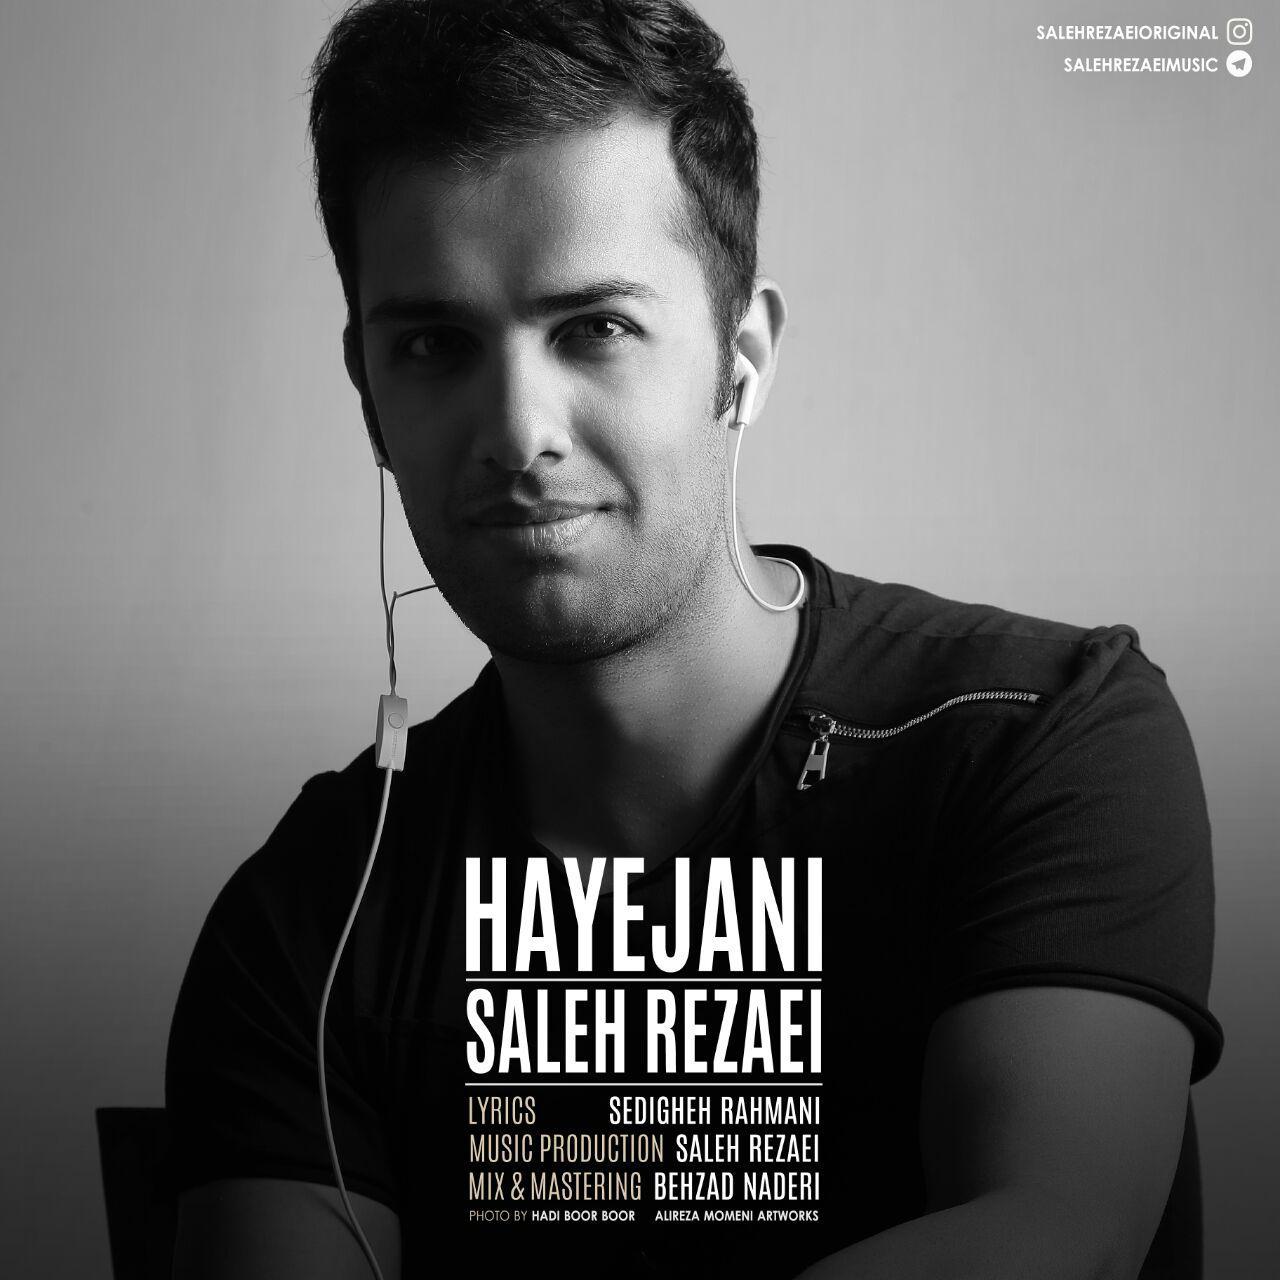 Saleh Rezaei Hayejan - دانلود آهنگ جدید صالح رضایی به نام هیجانی